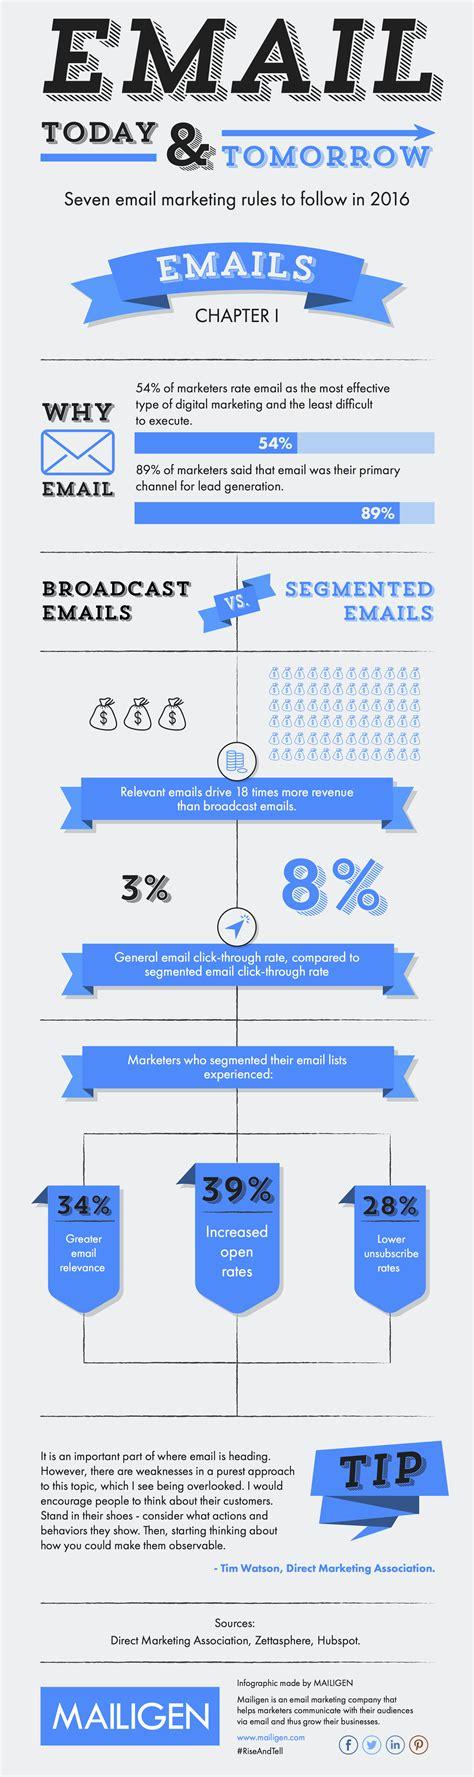 Email Marketing by Key Email Marketing Stats Smart Insights Digital Marketing